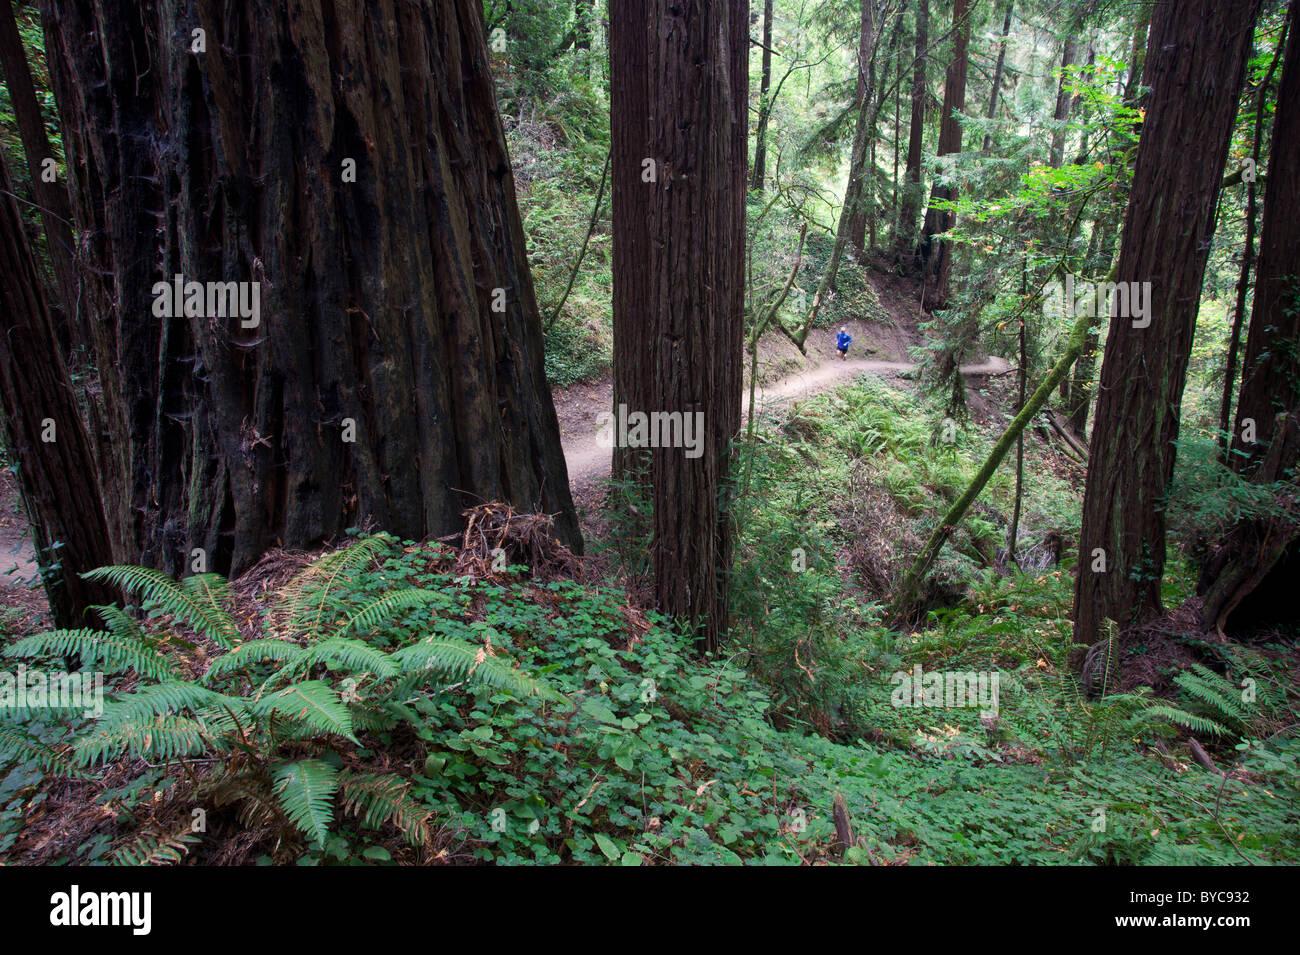 Trail running in The Forest of Nisene Marks State Park, Aptos, California (model released) - Stock Image